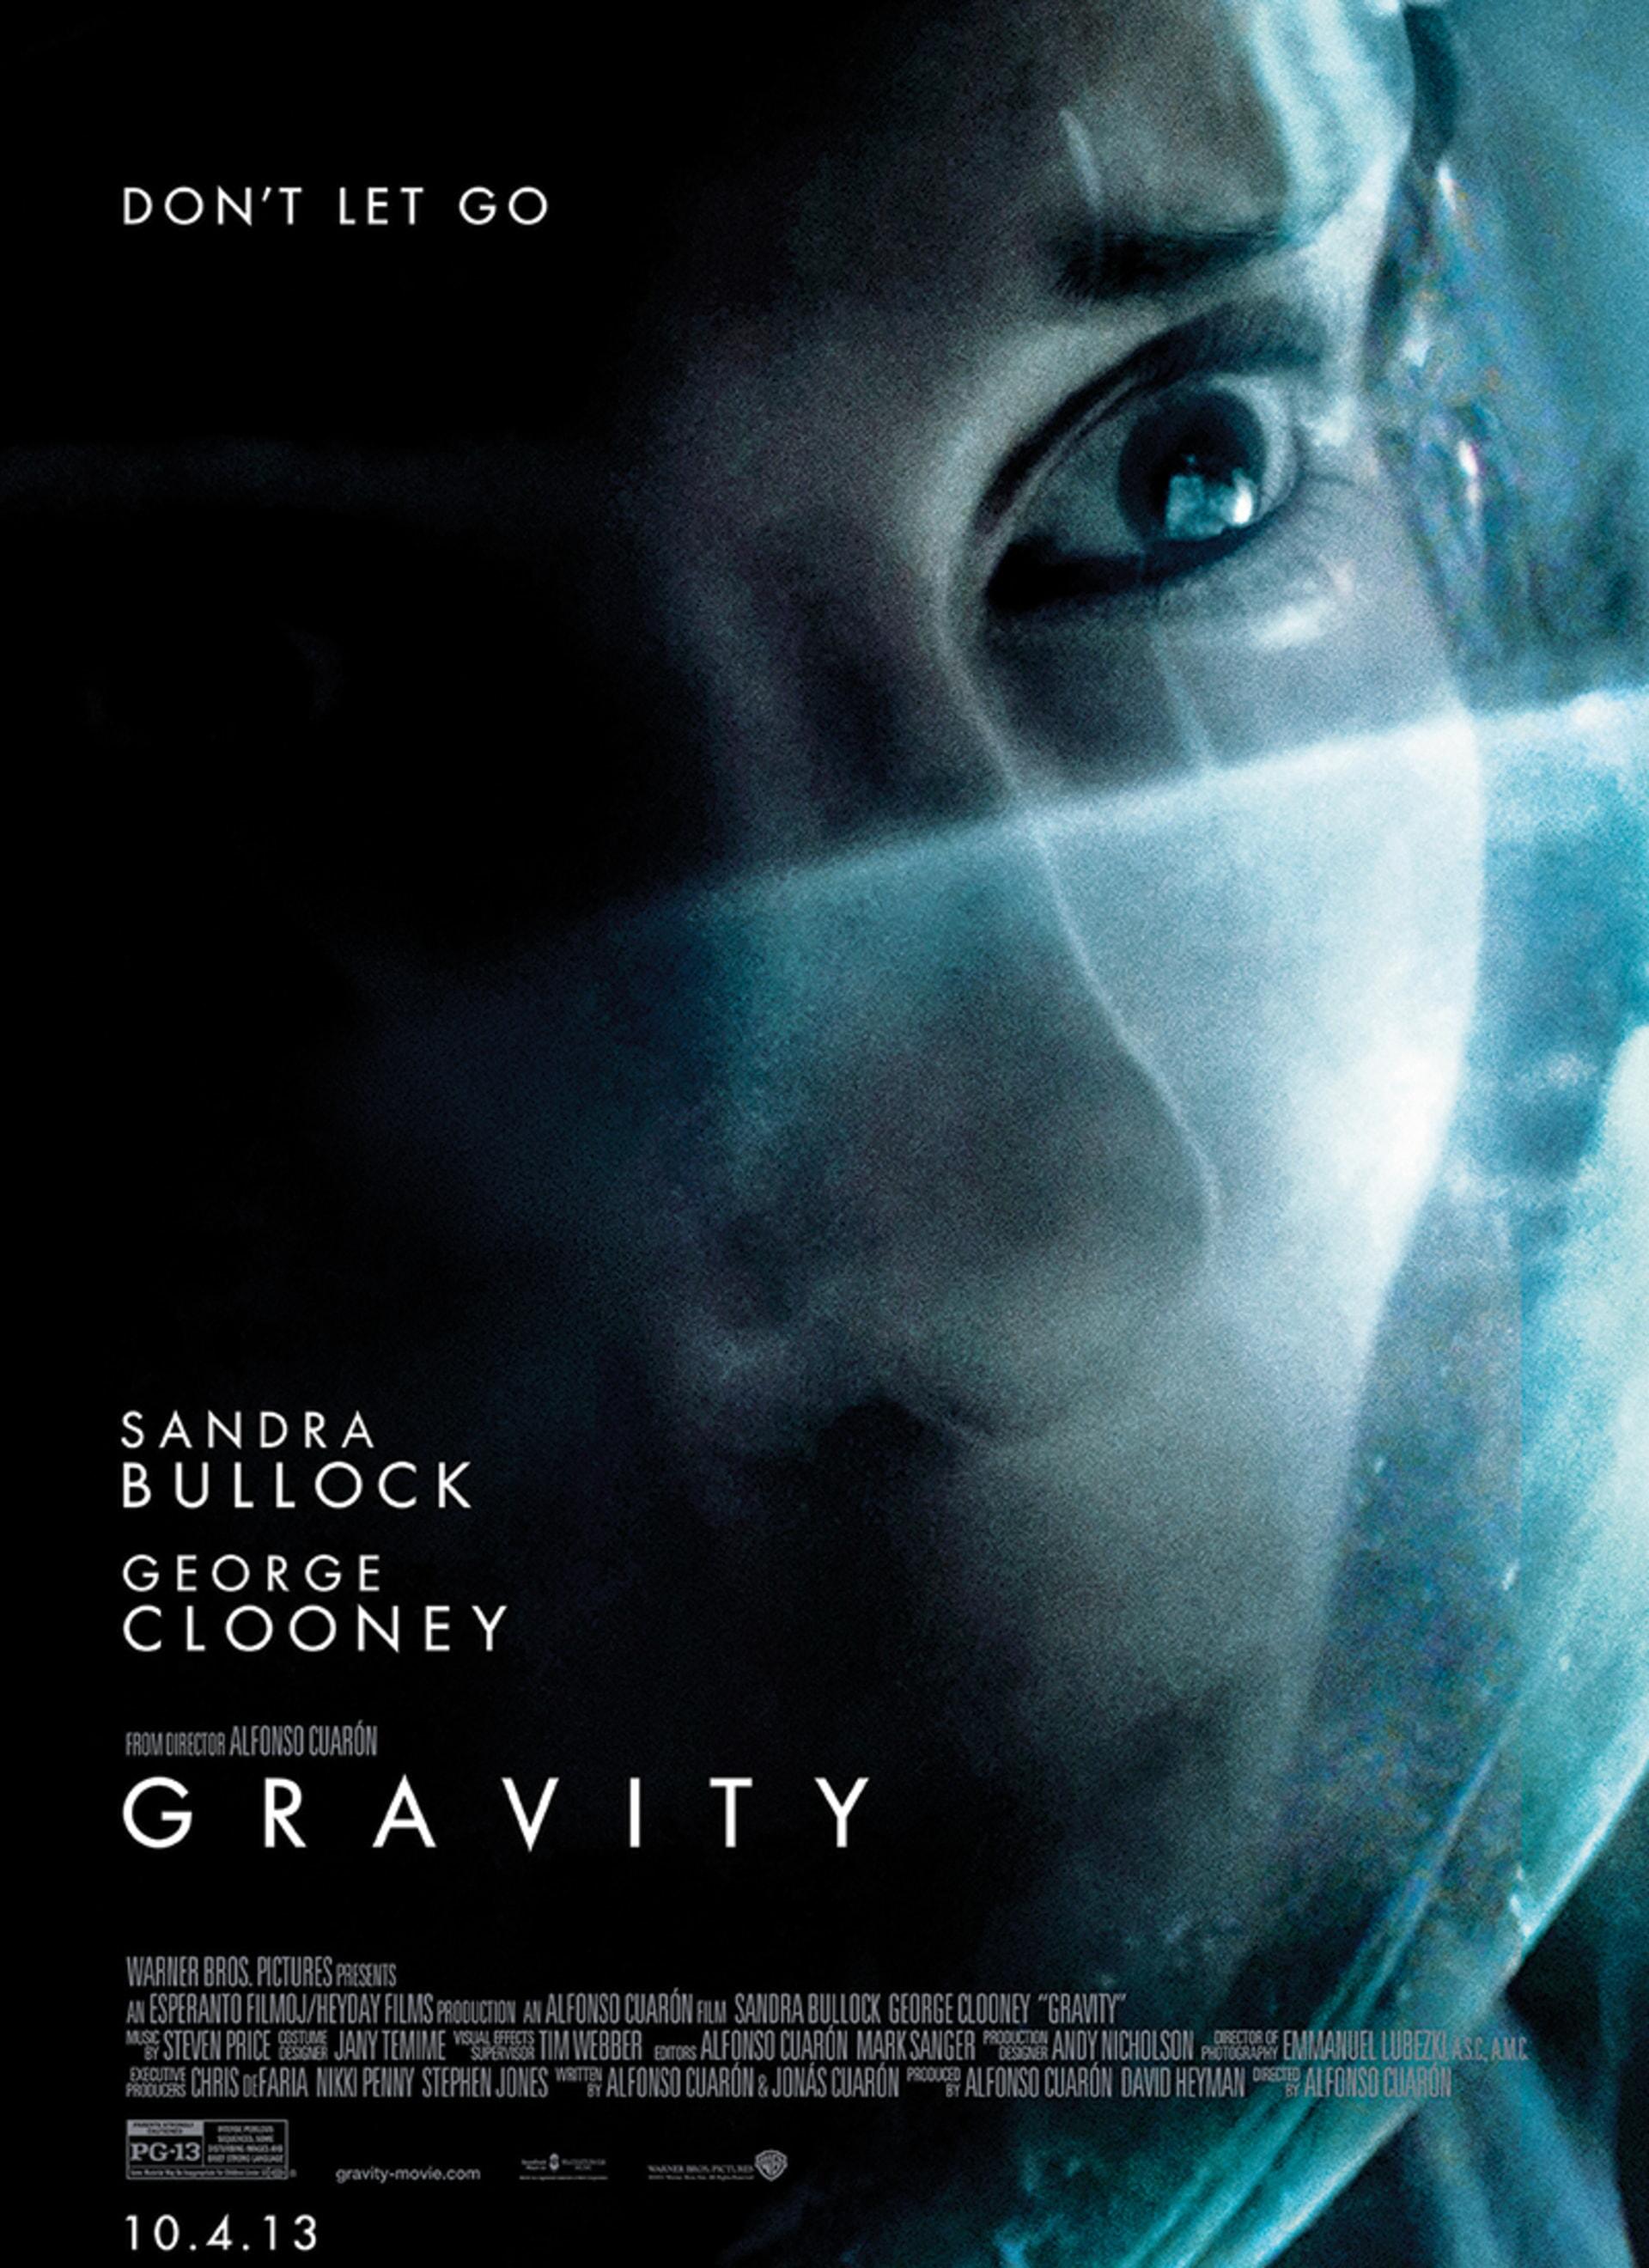 Gravity - Poster 1